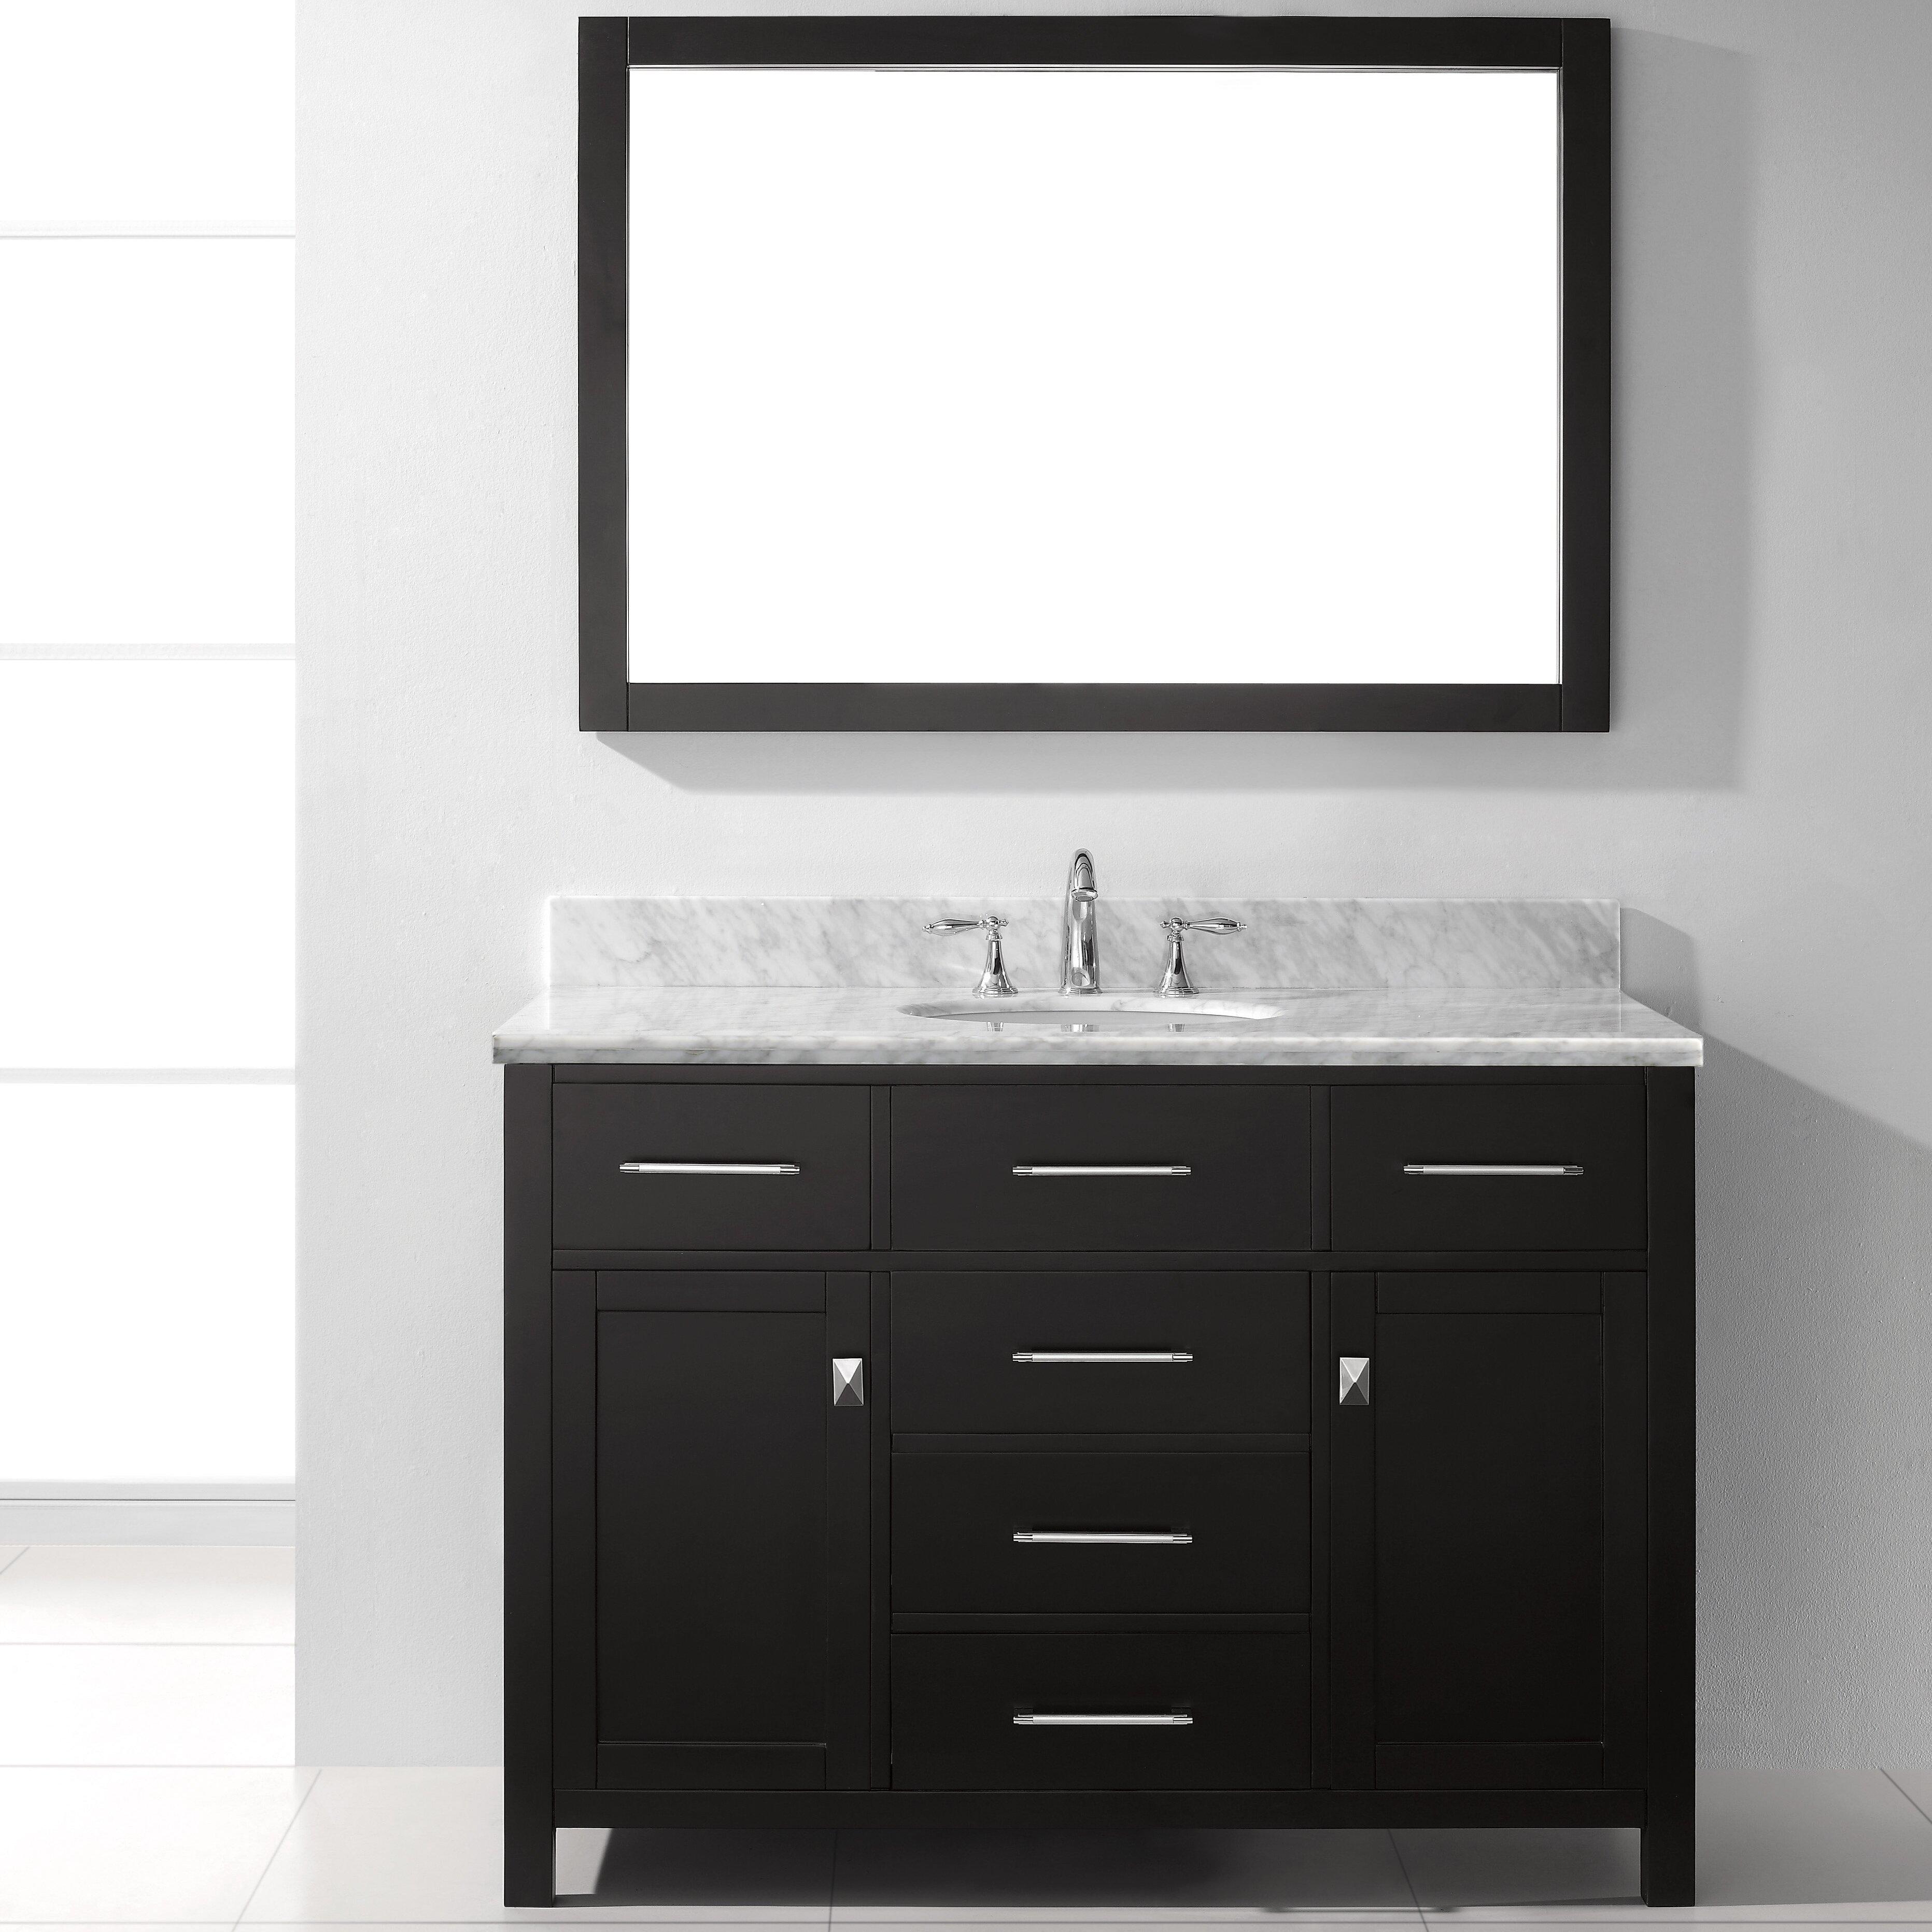 Virtu caroline 48 single bathroom vanity set with carrara for Vanity and mirror set